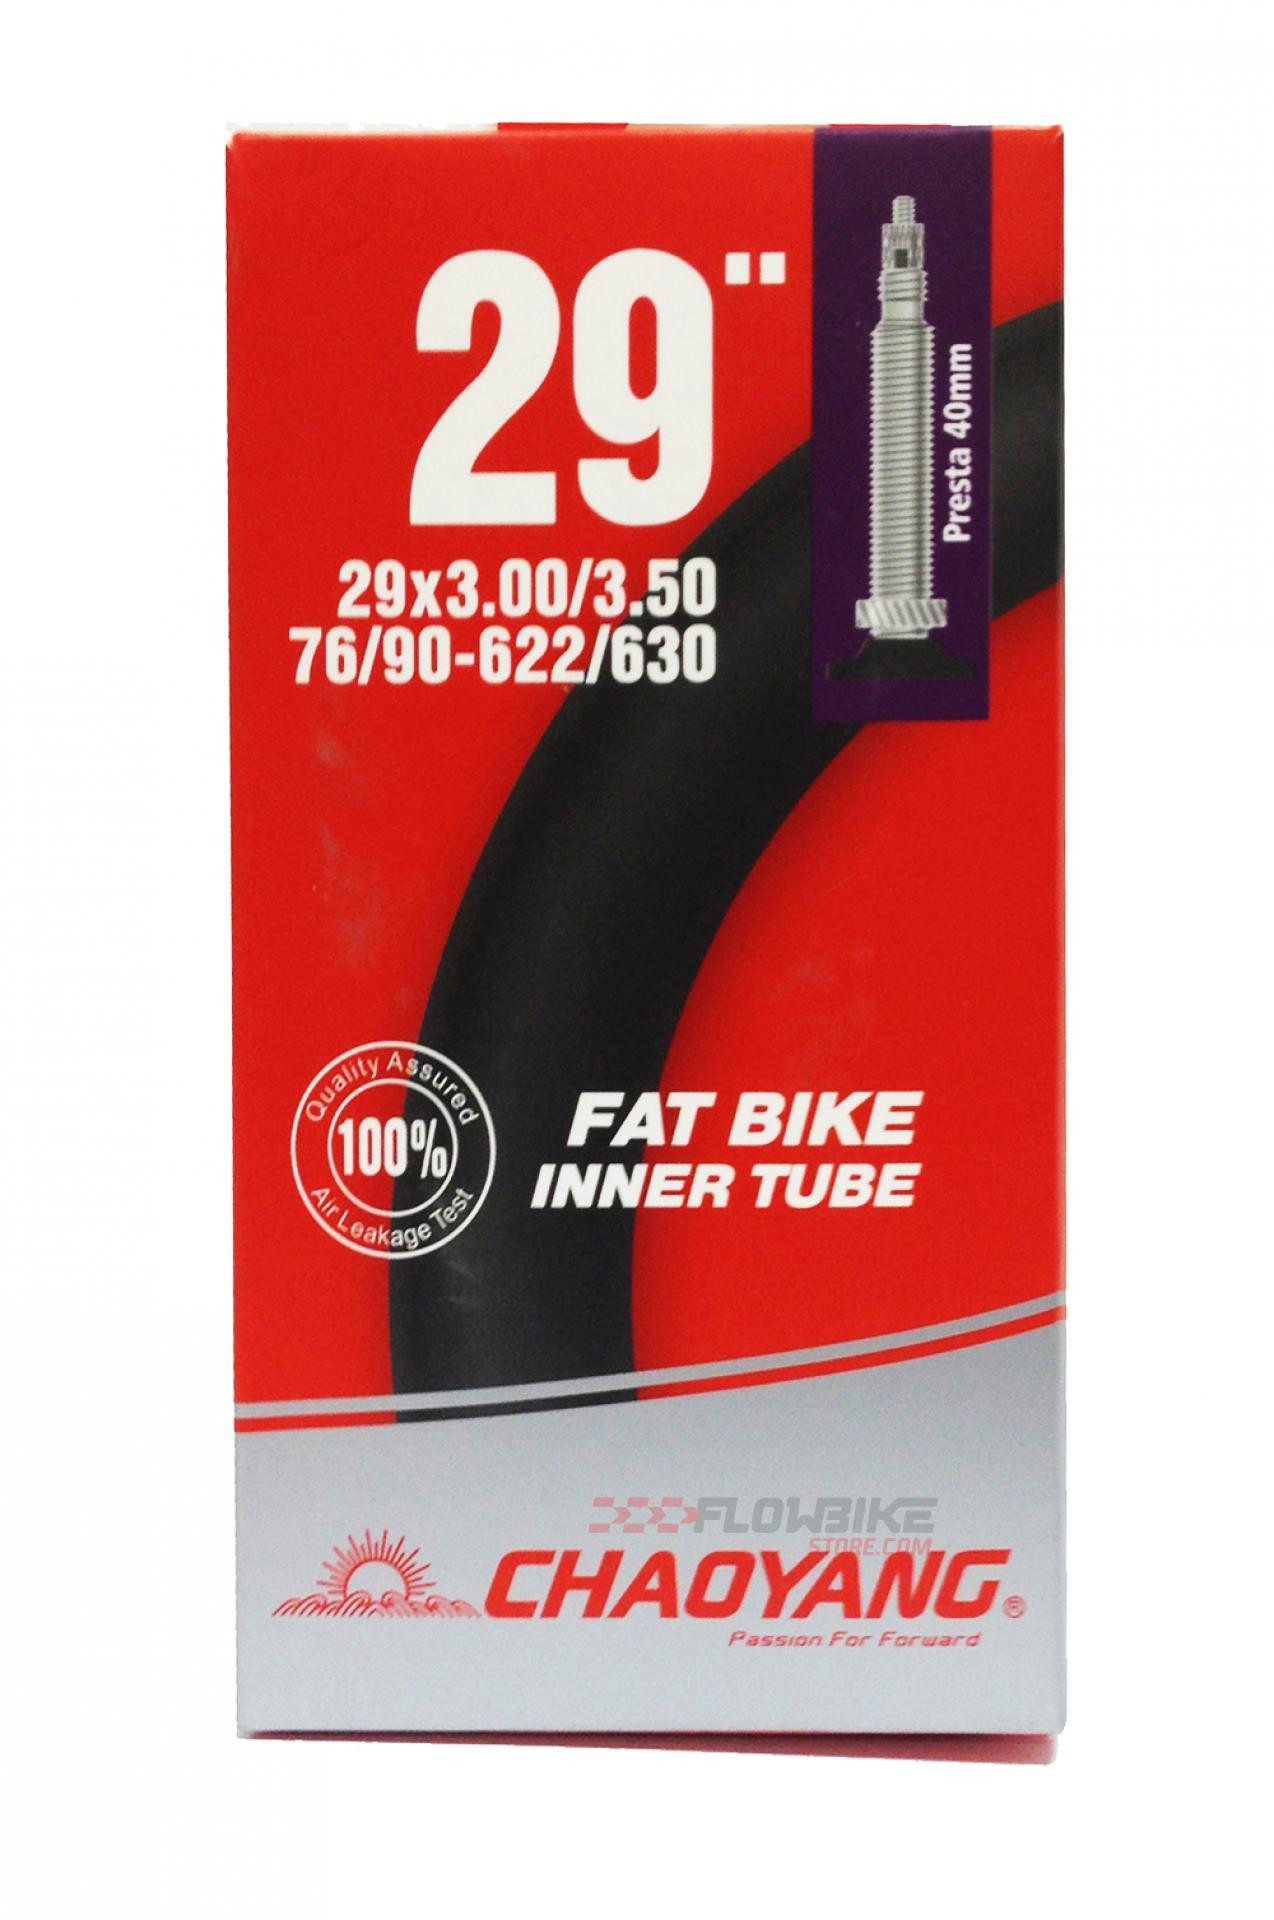 4b52a2a71 Chaoyang Fat bike inner tube 29x3.0 3.5 FV